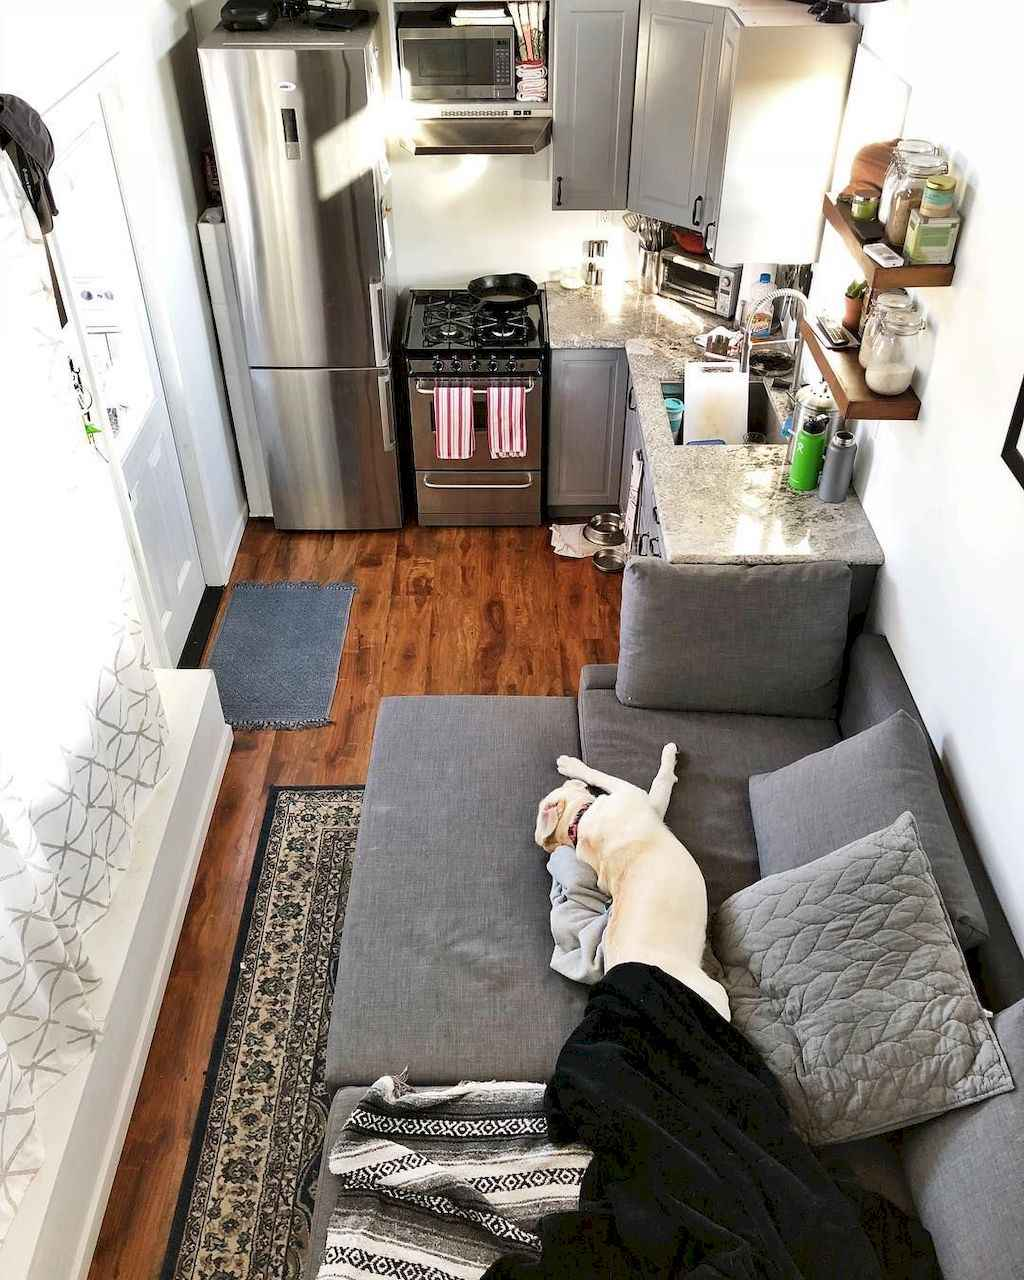 27 Tiny House Kitchen Storage Organization and Tips Ideas